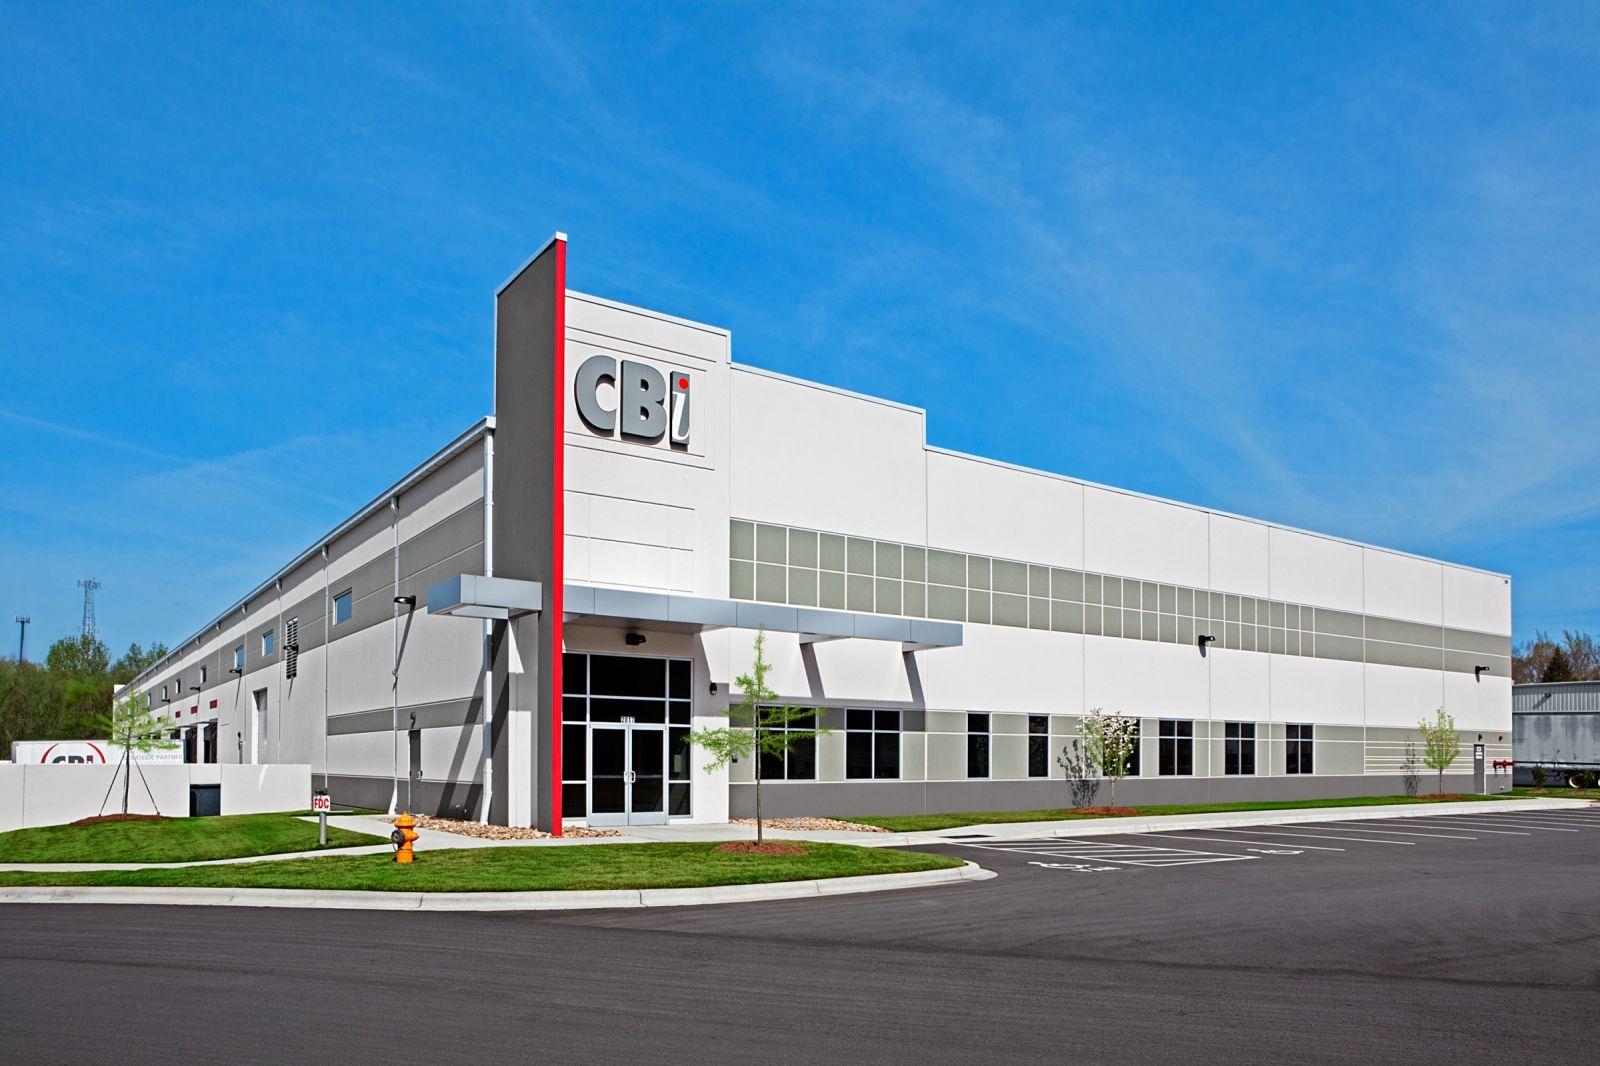 Mid carolina charlotte nc distribution center best cars - Interior design firms in charlotte nc ...